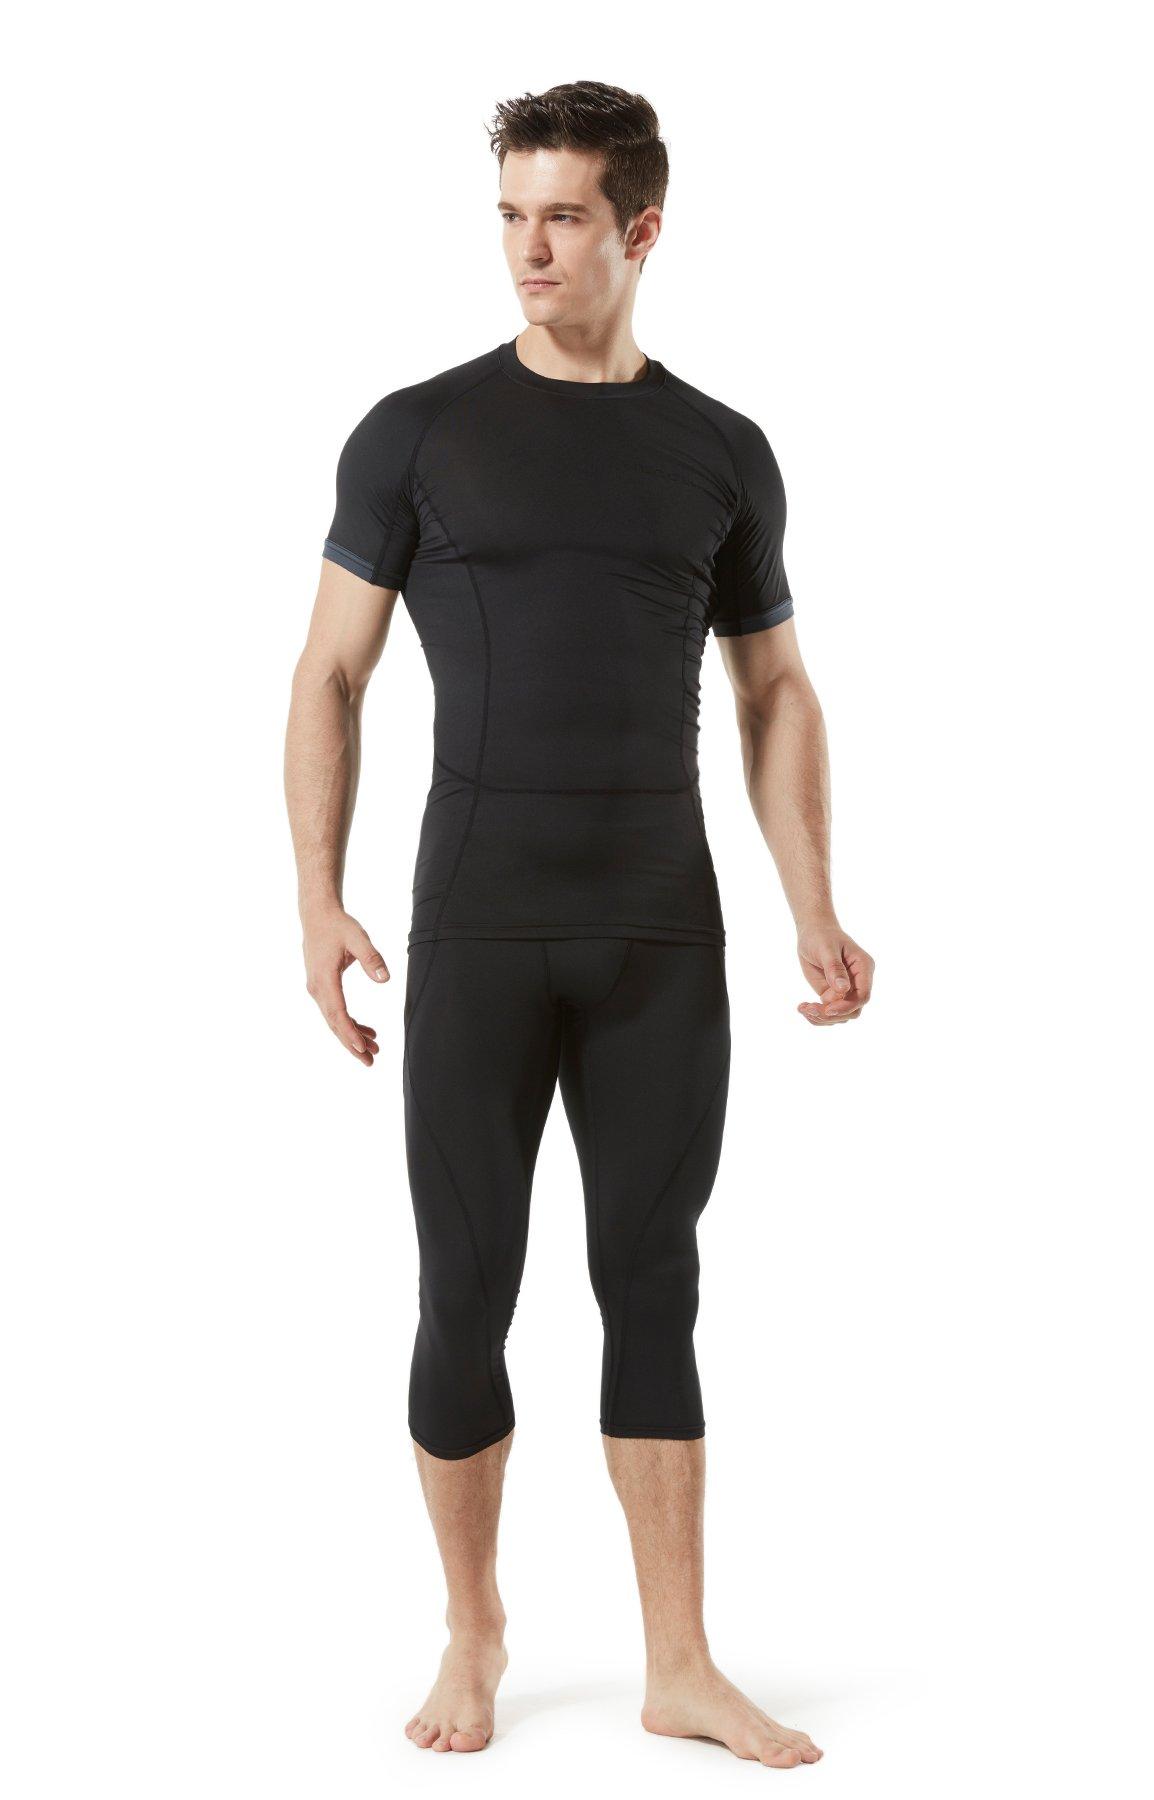 TM-MUC18-KLB_X-Small Tesla Men's Compression Capri Shorts Baselayer Cool Dry Sports Tights MUC18 by TSLA (Image #8)